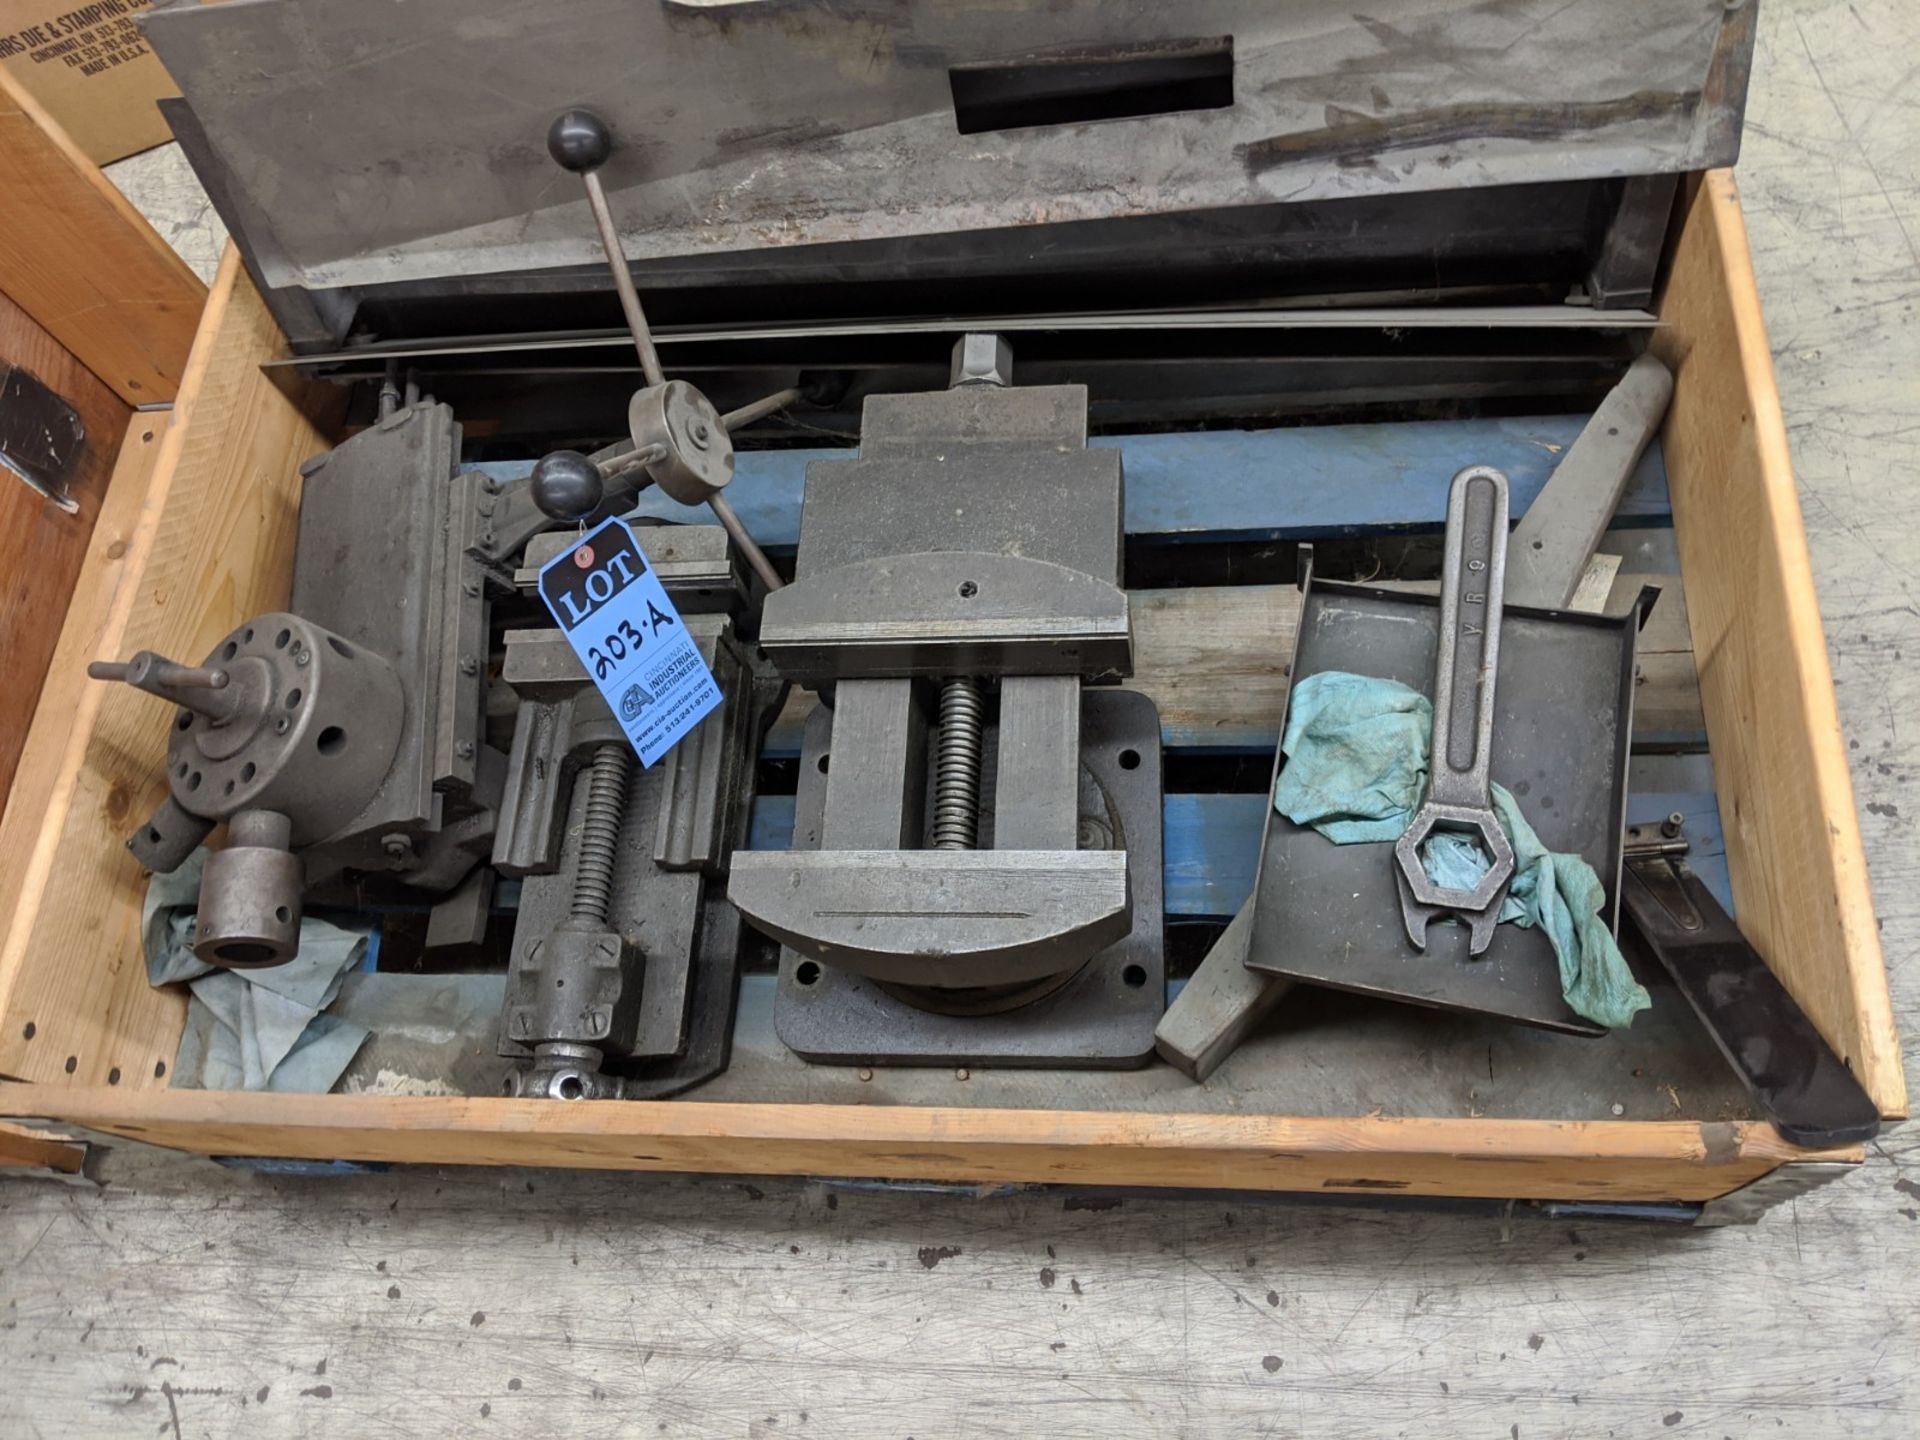 (LOT) MACHINE ACCESSORES IN CRATE - Image 2 of 3